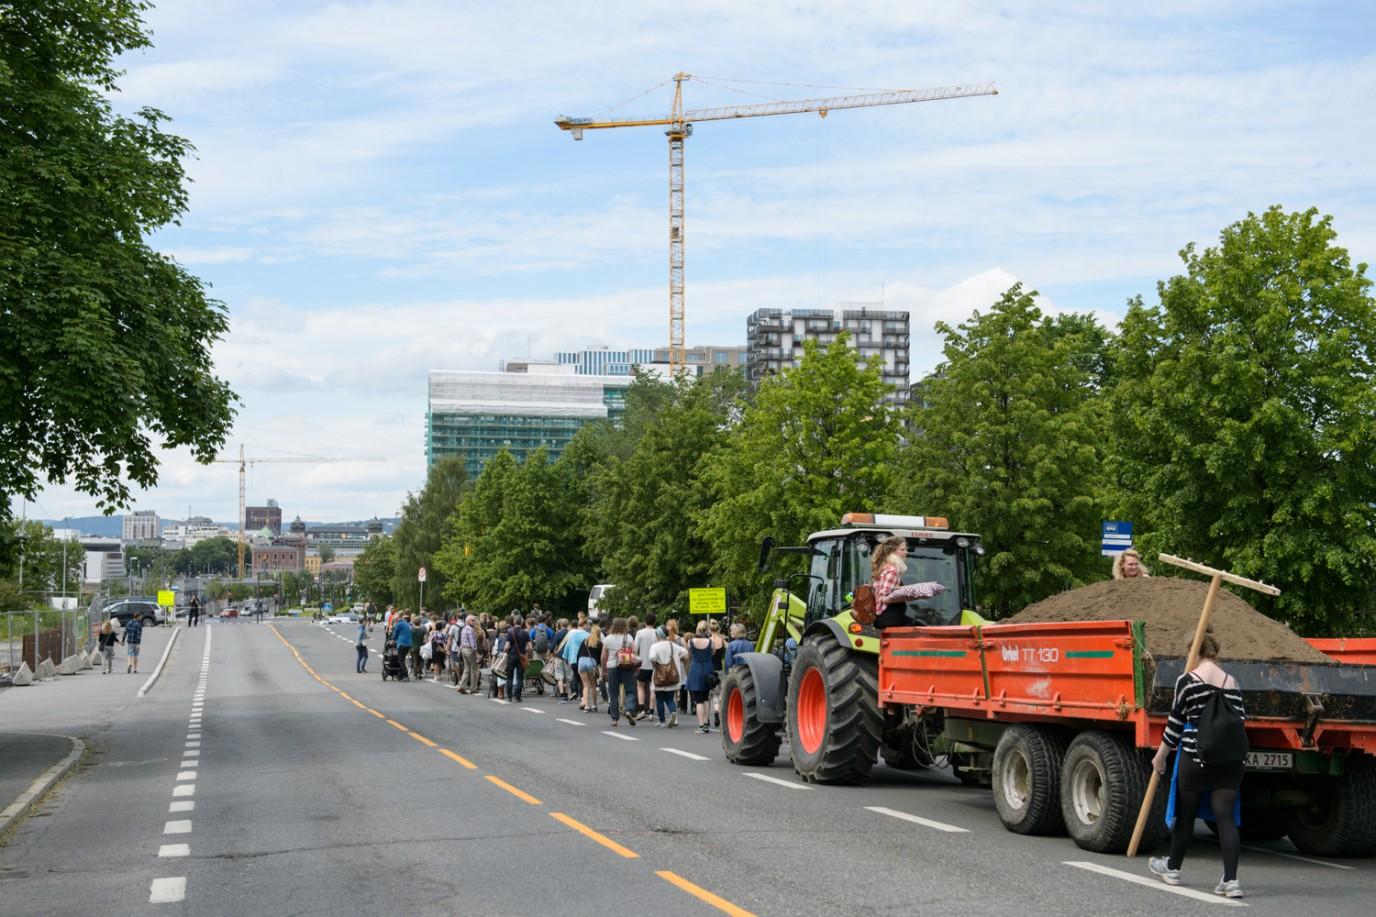 Flatbread Society Soil Procession